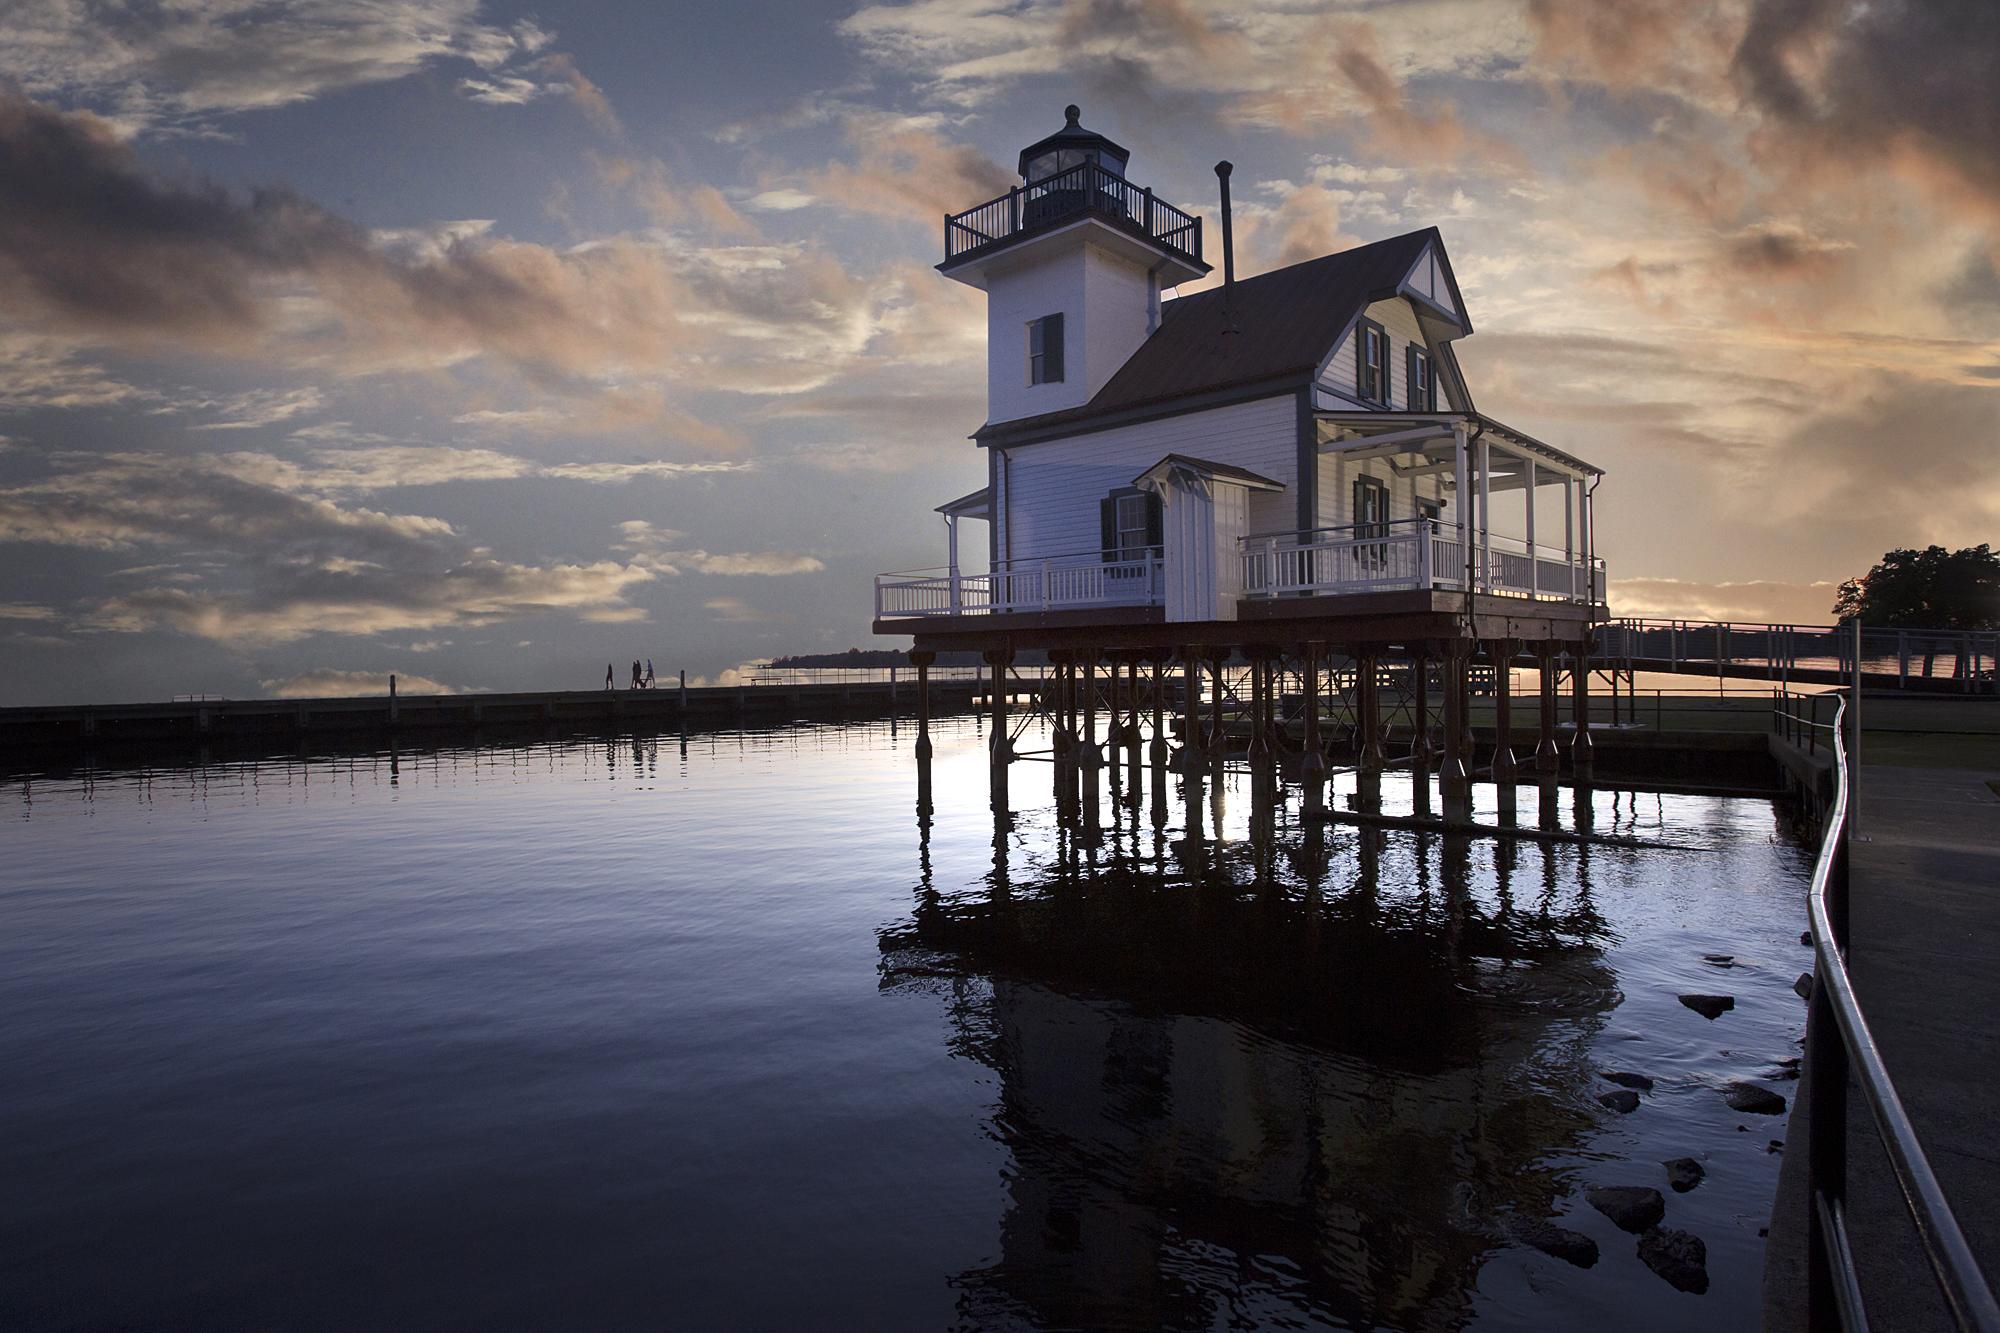 LighthouseB.jpg